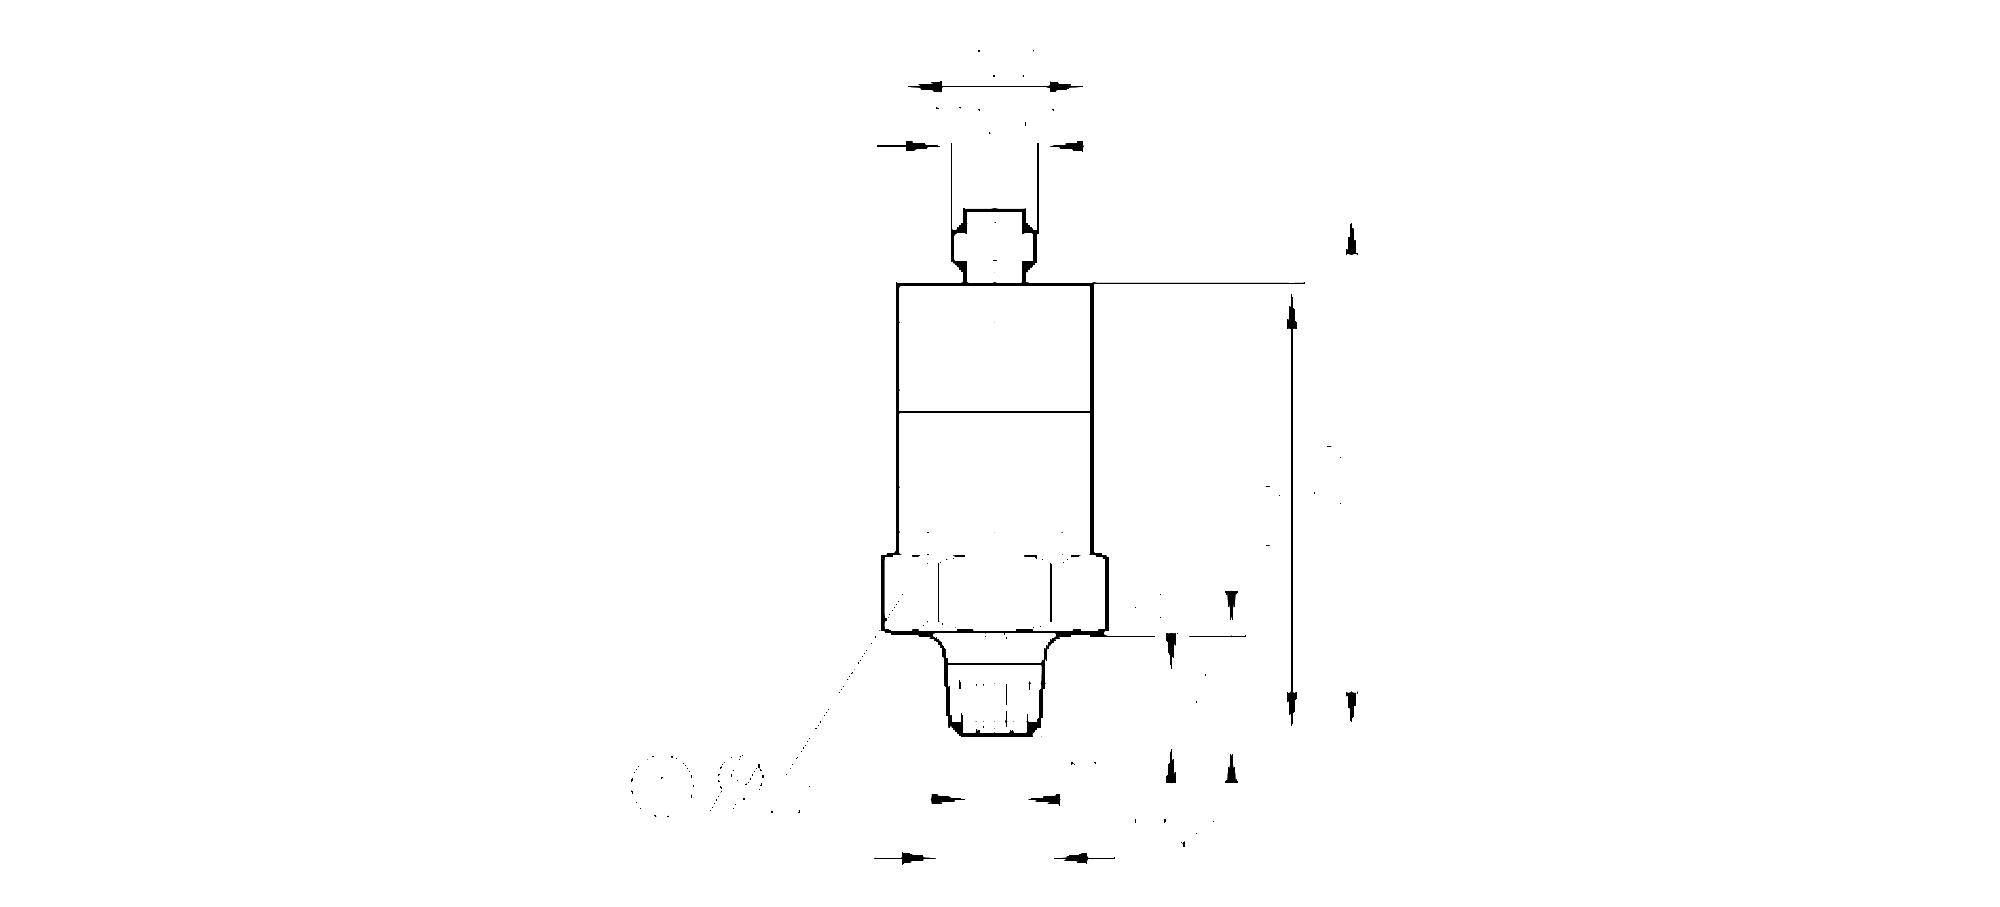 pk6220